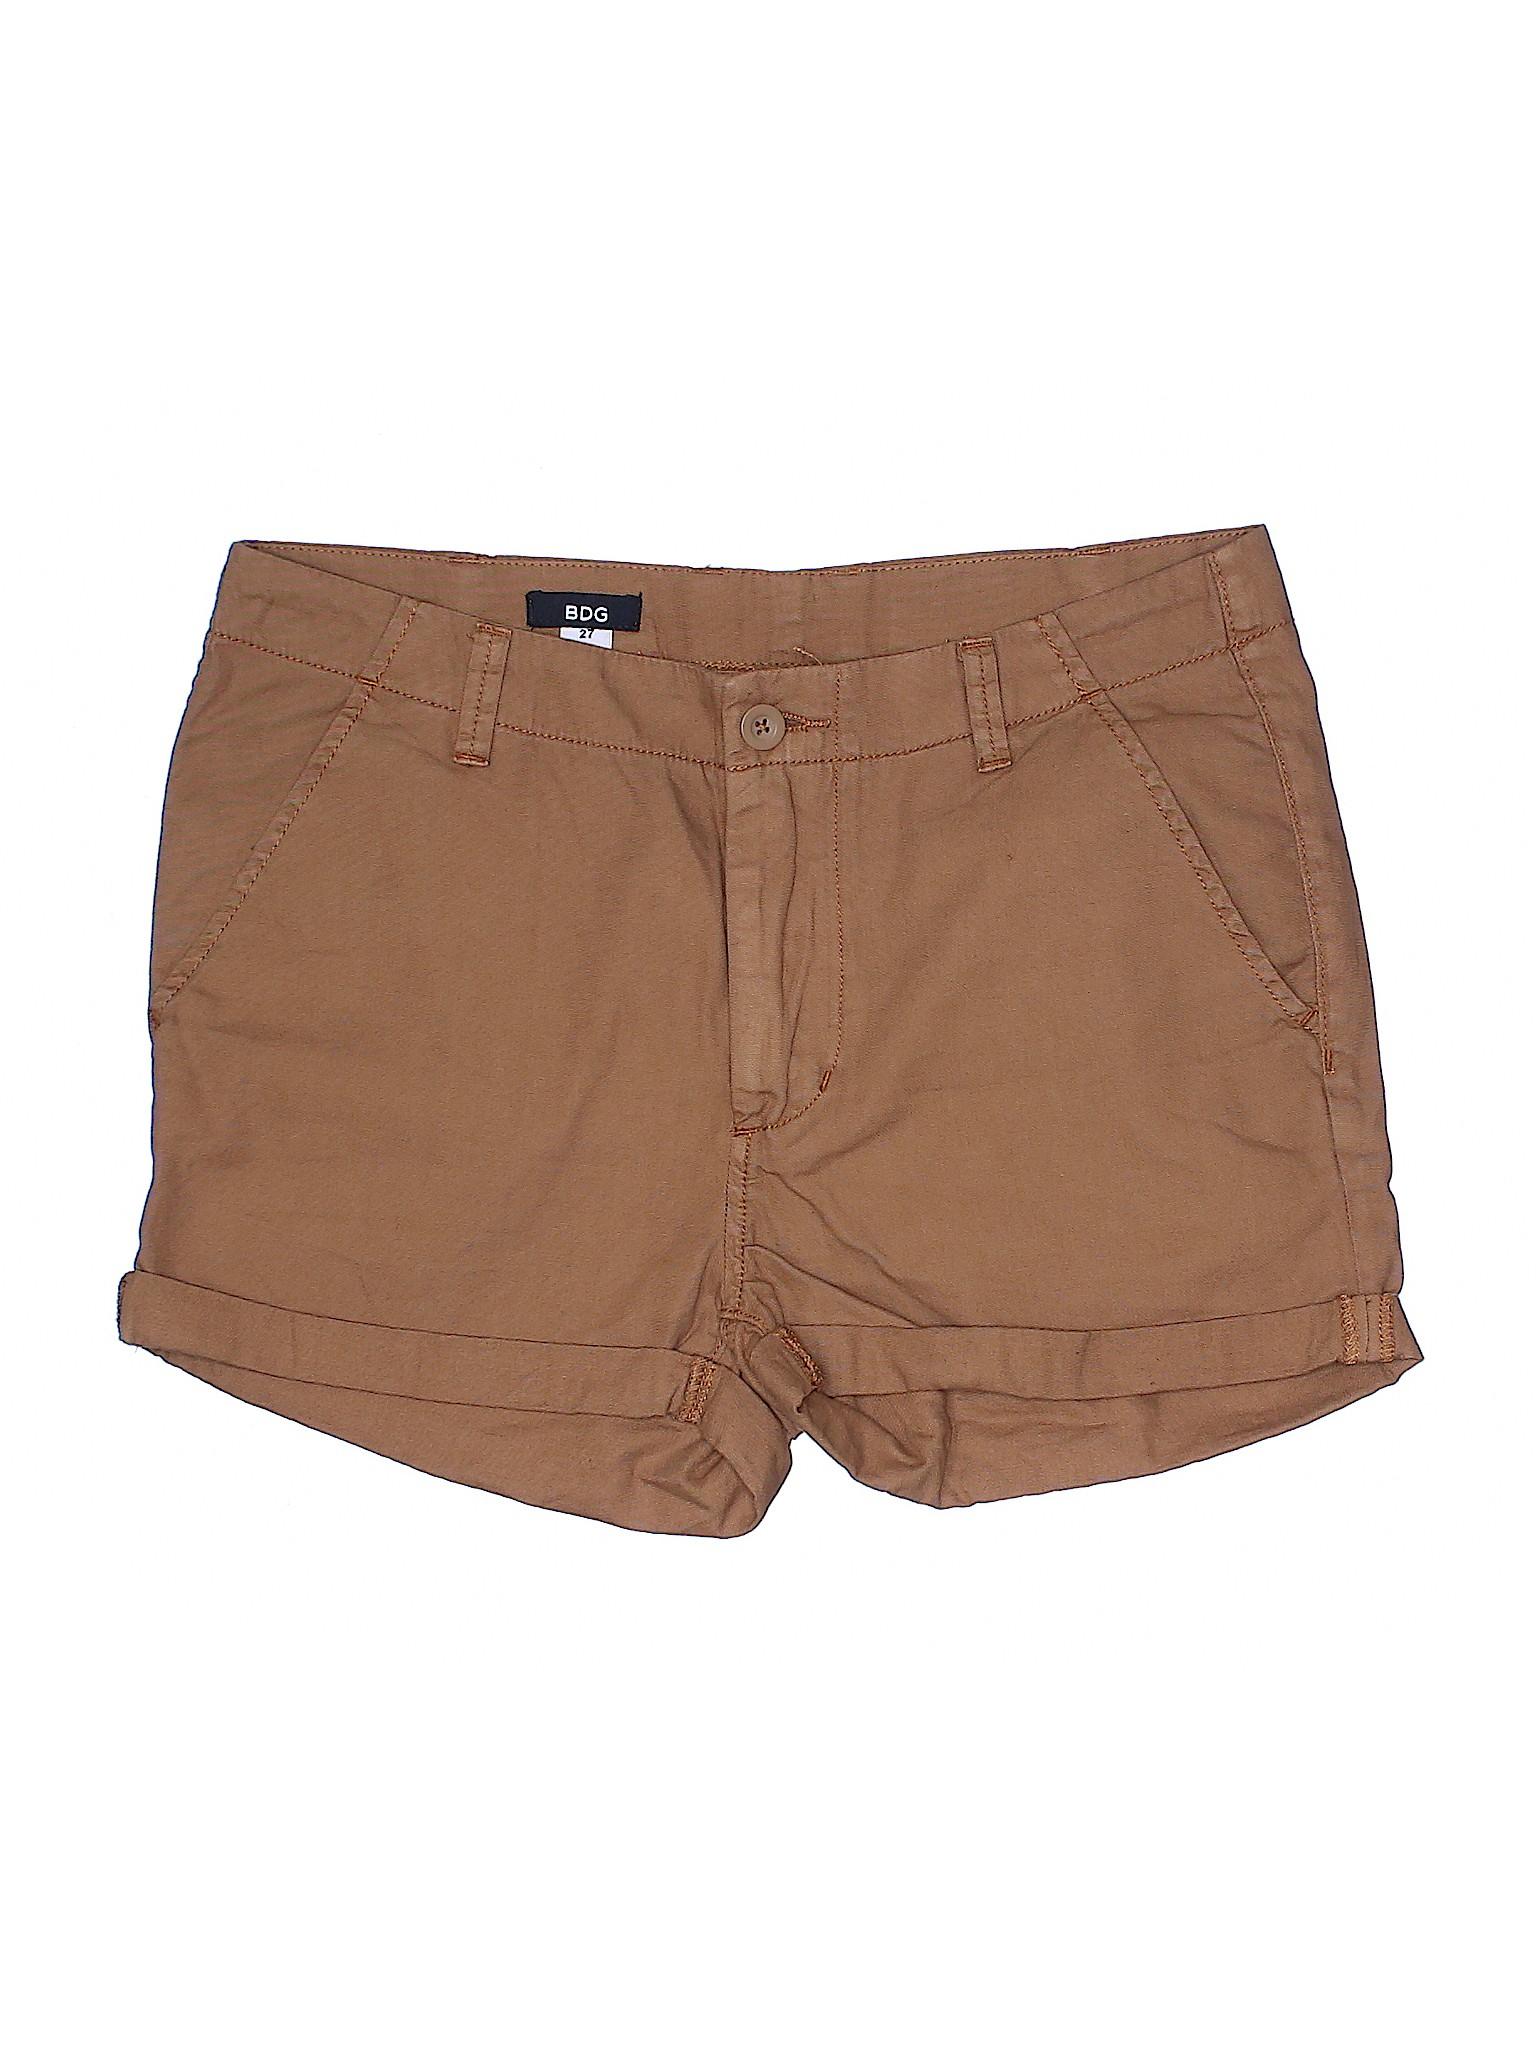 Leisure winter Shorts Leisure Khaki Leisure BDG Khaki Shorts Shorts winter winter BDG BDG Khaki FBwpFqHA